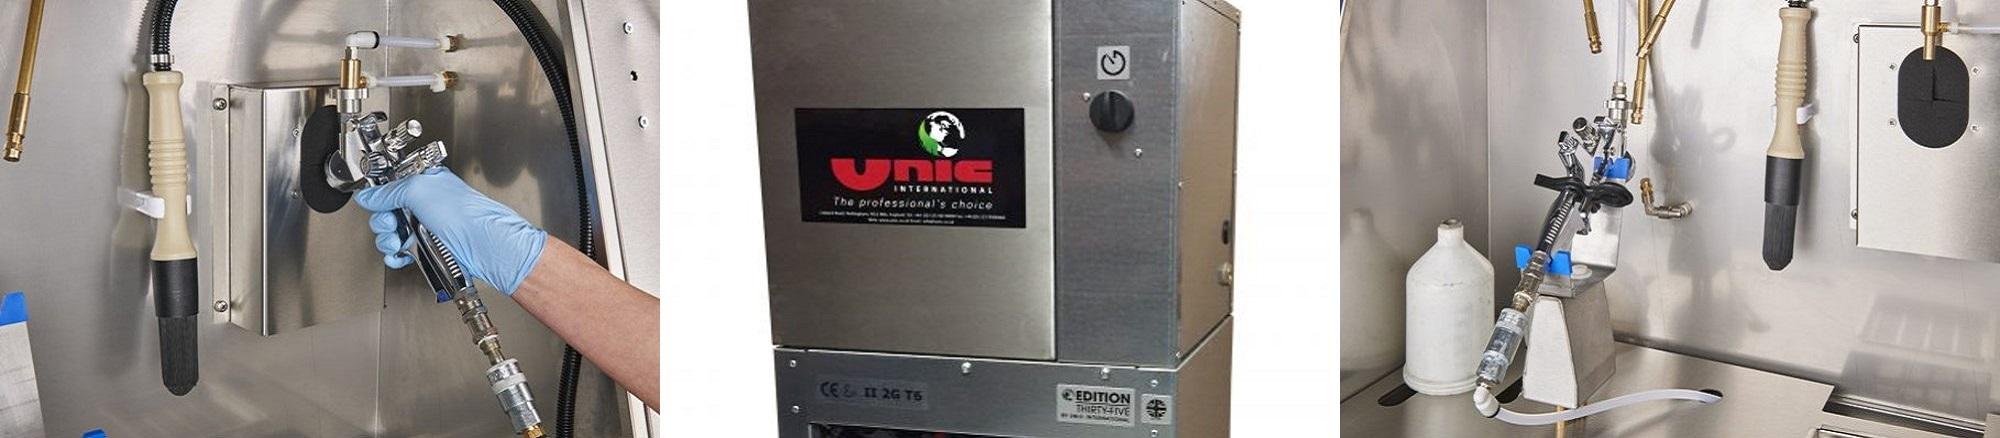 Yorkshire Spray Services Ltd - Unic International Gun Cleaners